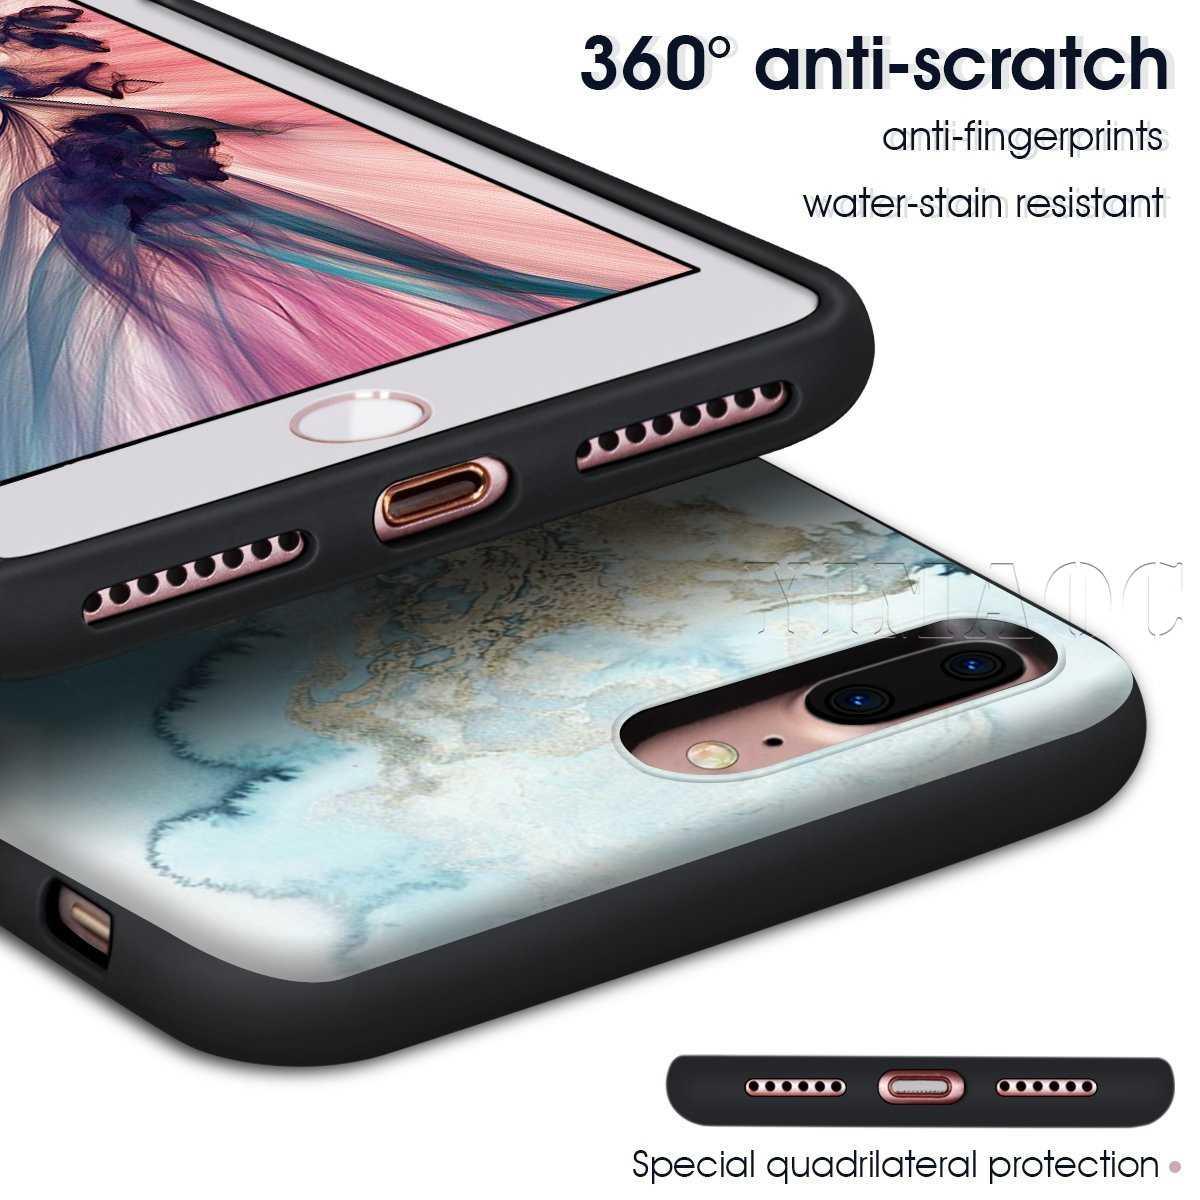 Силиконовый мягкий чехол для iPhone 11 Pro XS Max XR X 8 7 6 6S Plus 5 5S SE